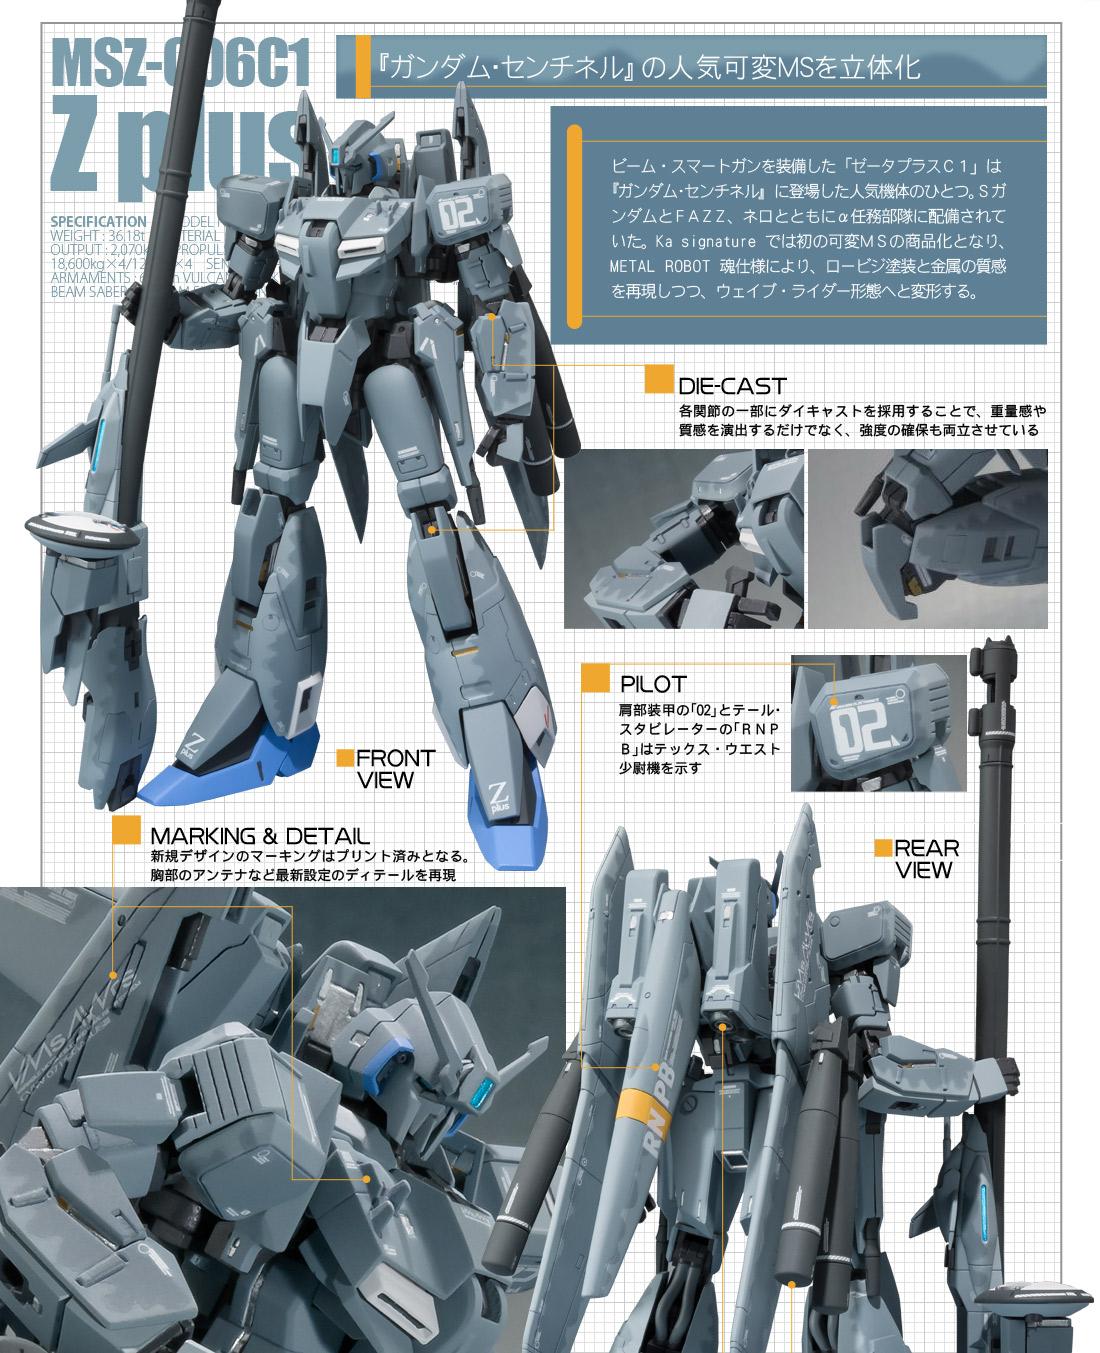 Gundam : Metal Robot Ka Signature (Bandai) CFnOtiM5_o